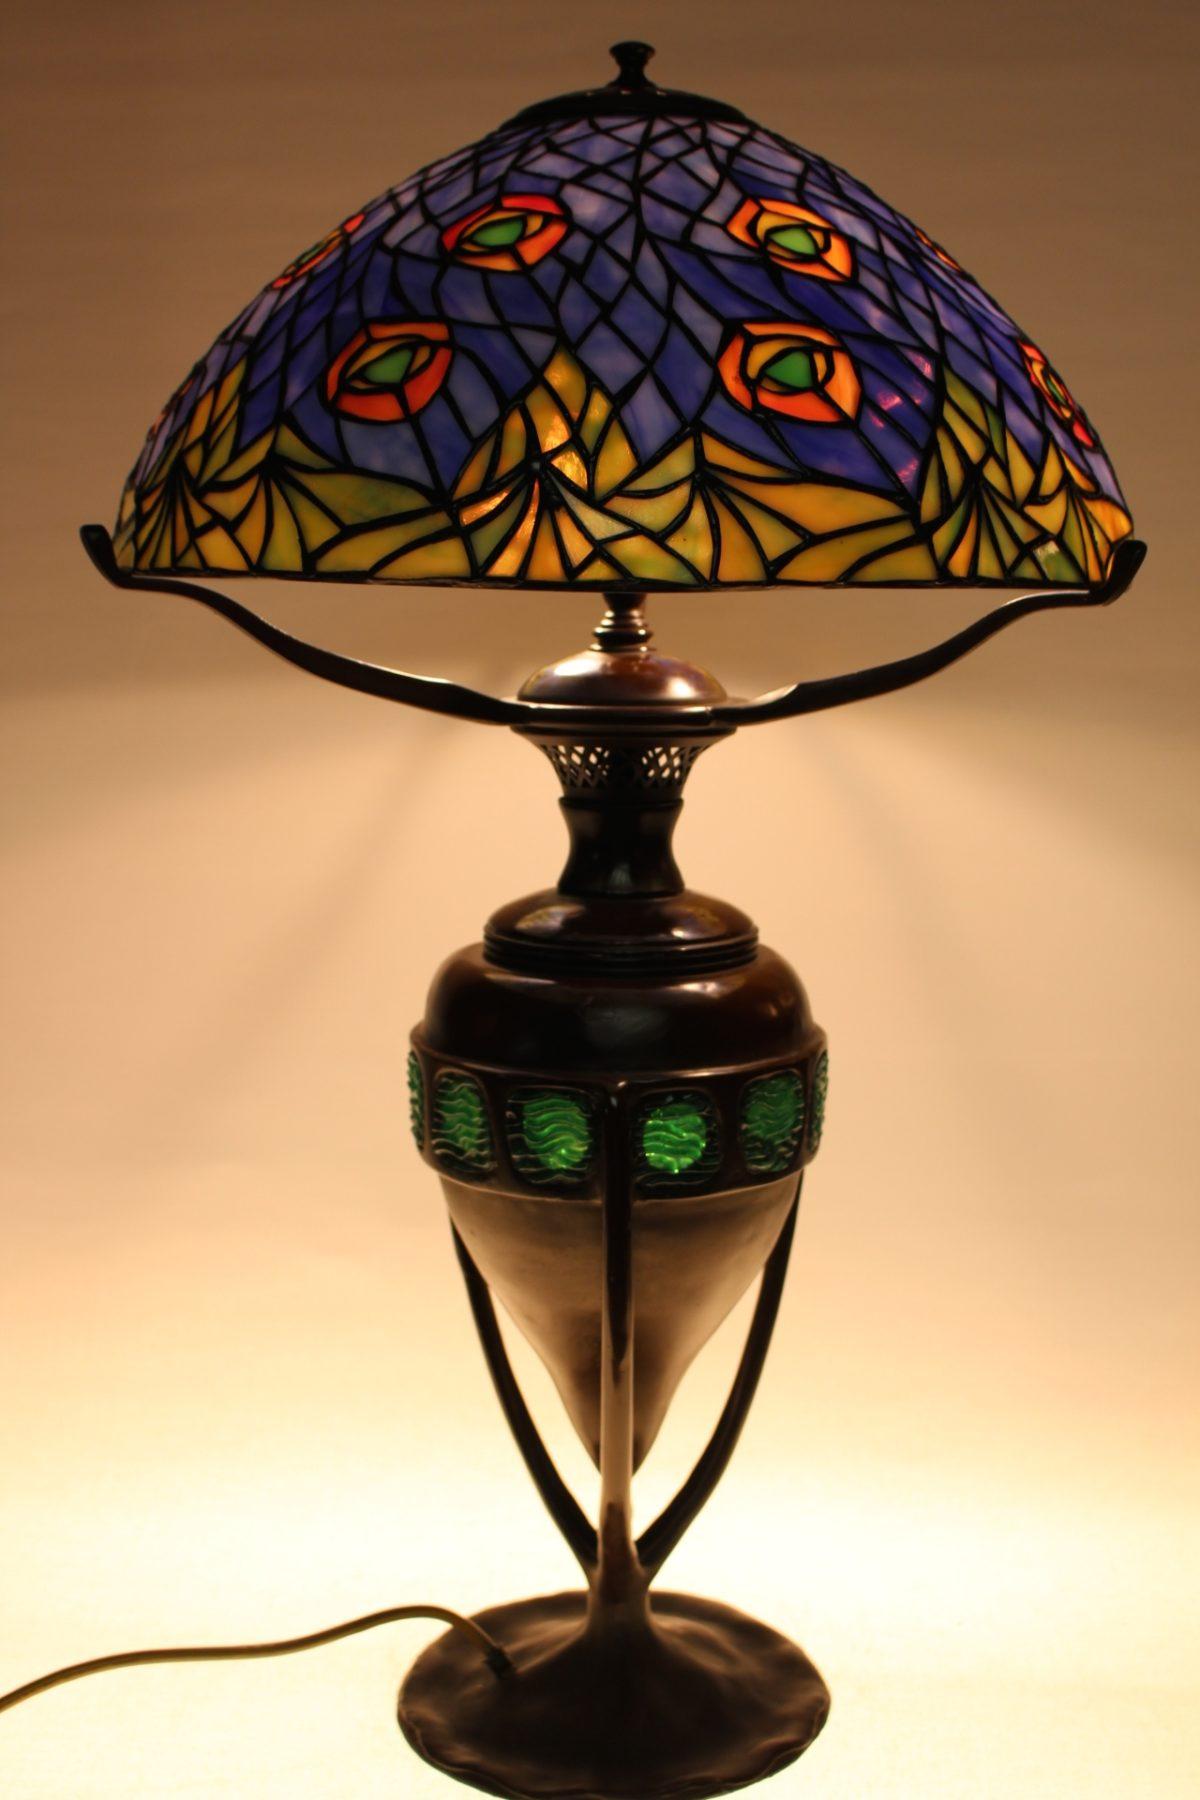 Tiffany Lampe, 70 x 41 x 20 cm